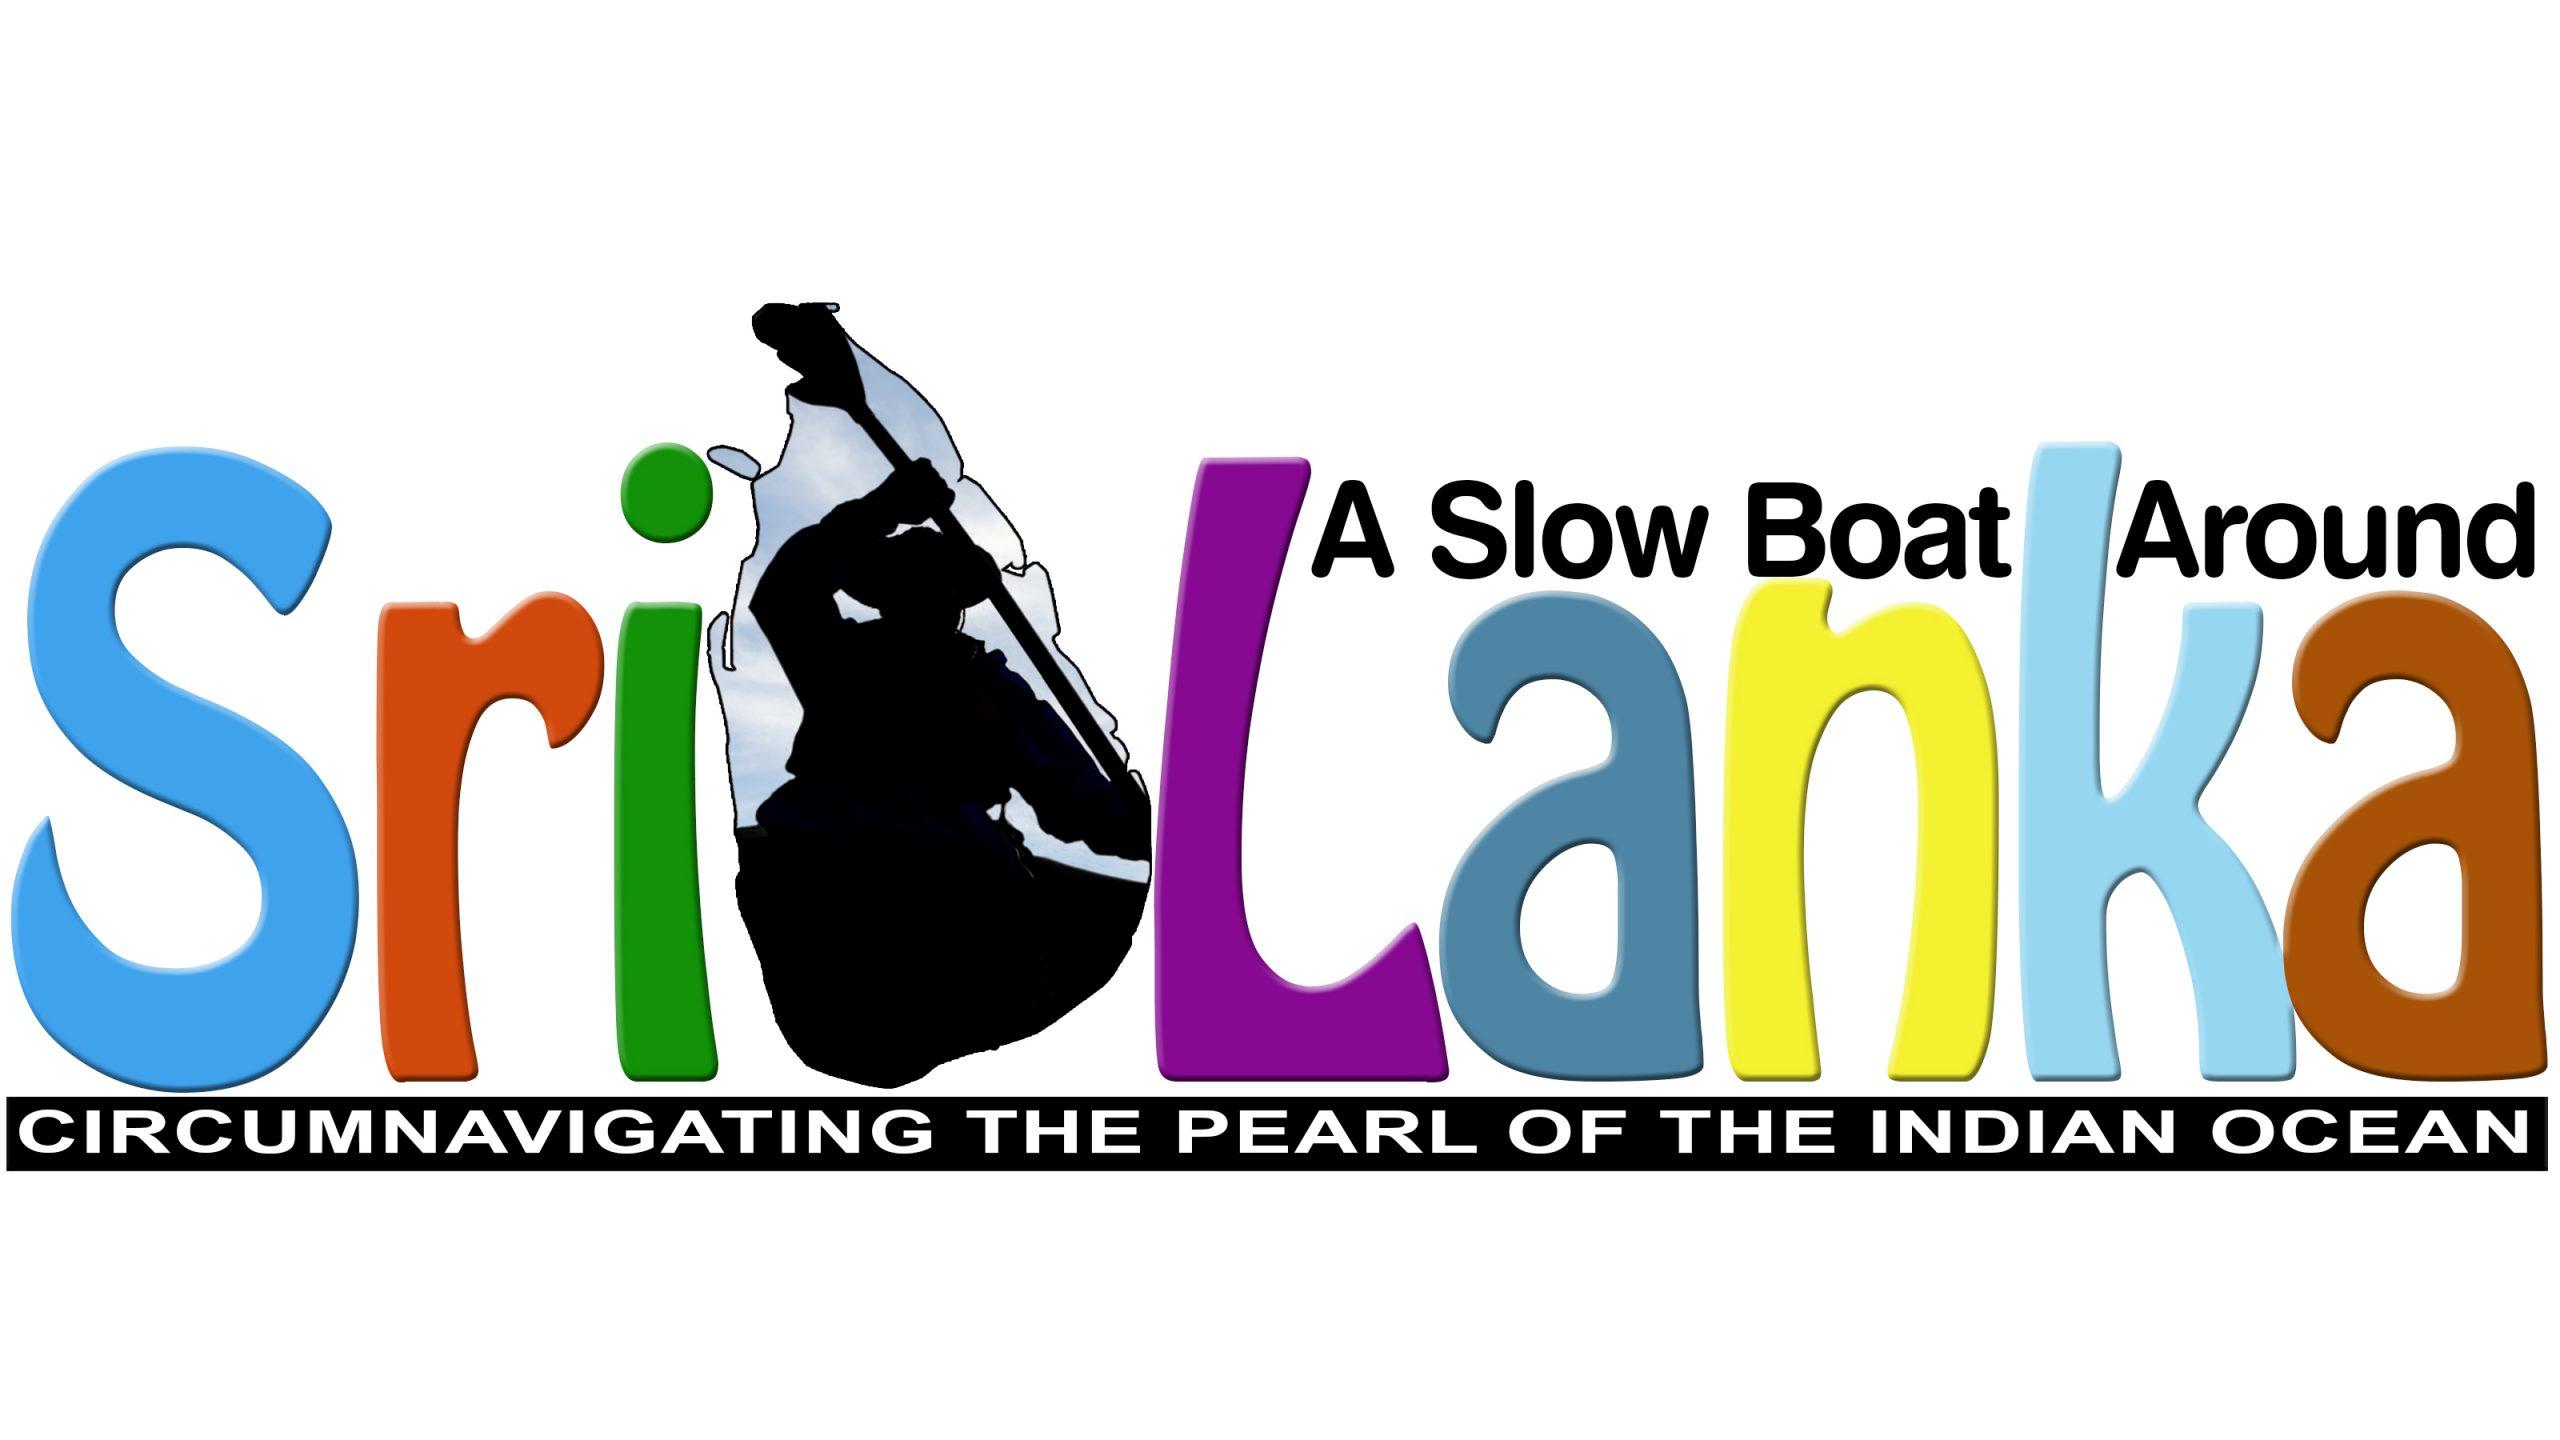 A Slow Boat Around Sri Lanka